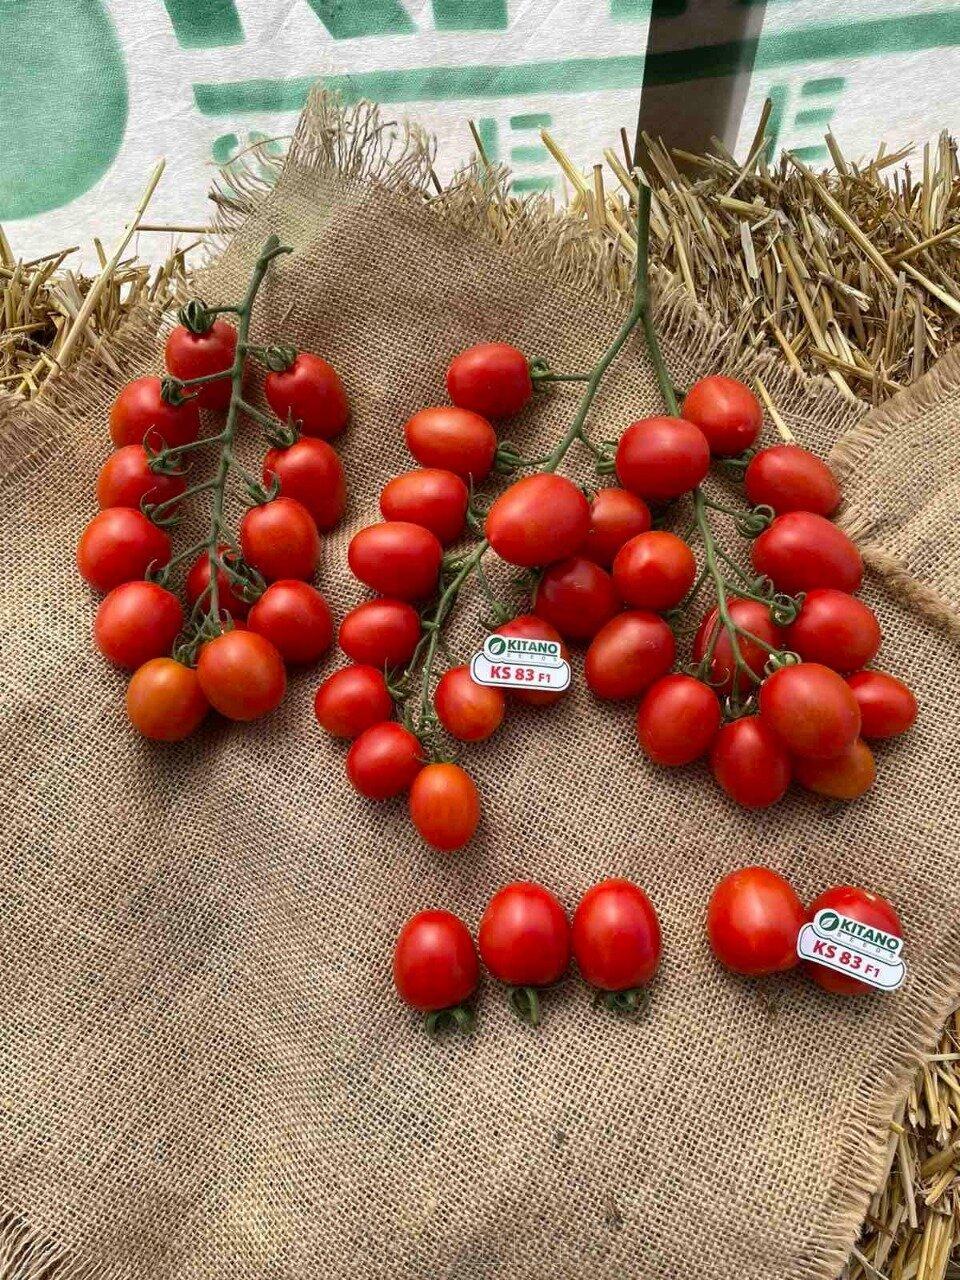 День поля по томатам от компании Kitano - фото pic_05bf40be9a4275203acb5952ef5c32ac_1920x9000_1.jpg